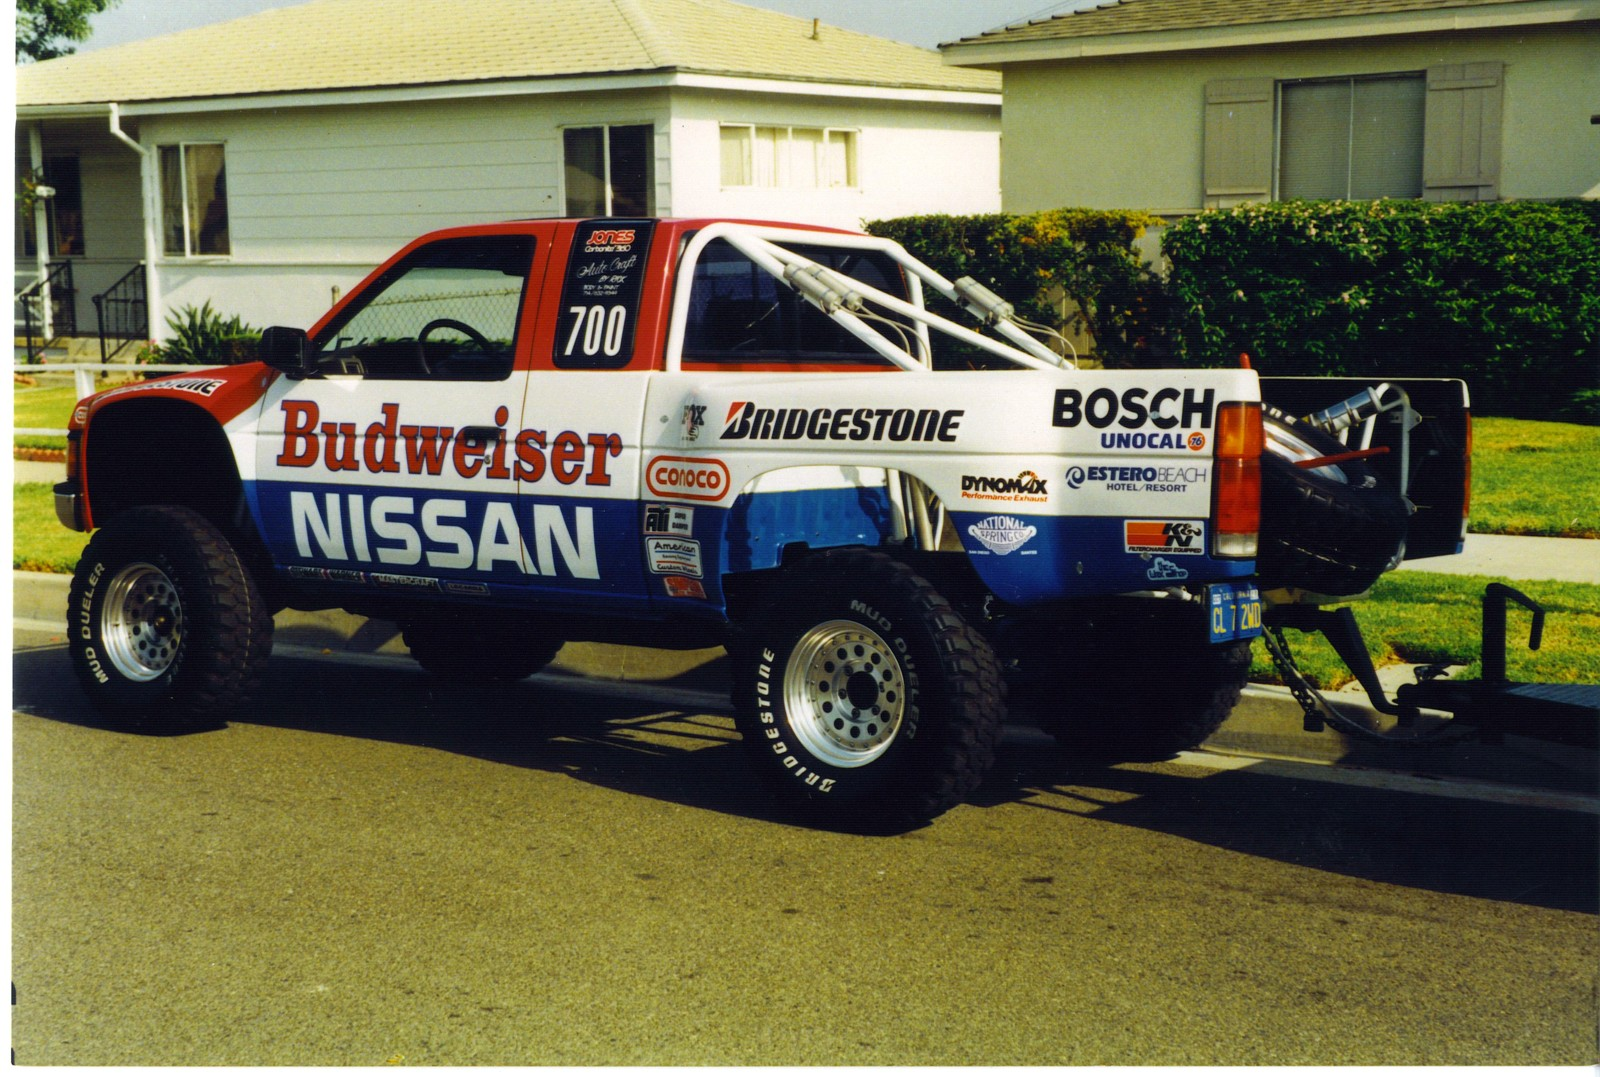 Nissan D21 24 Crew Cab 4x4: Photos, Reviews, News, Specs ...